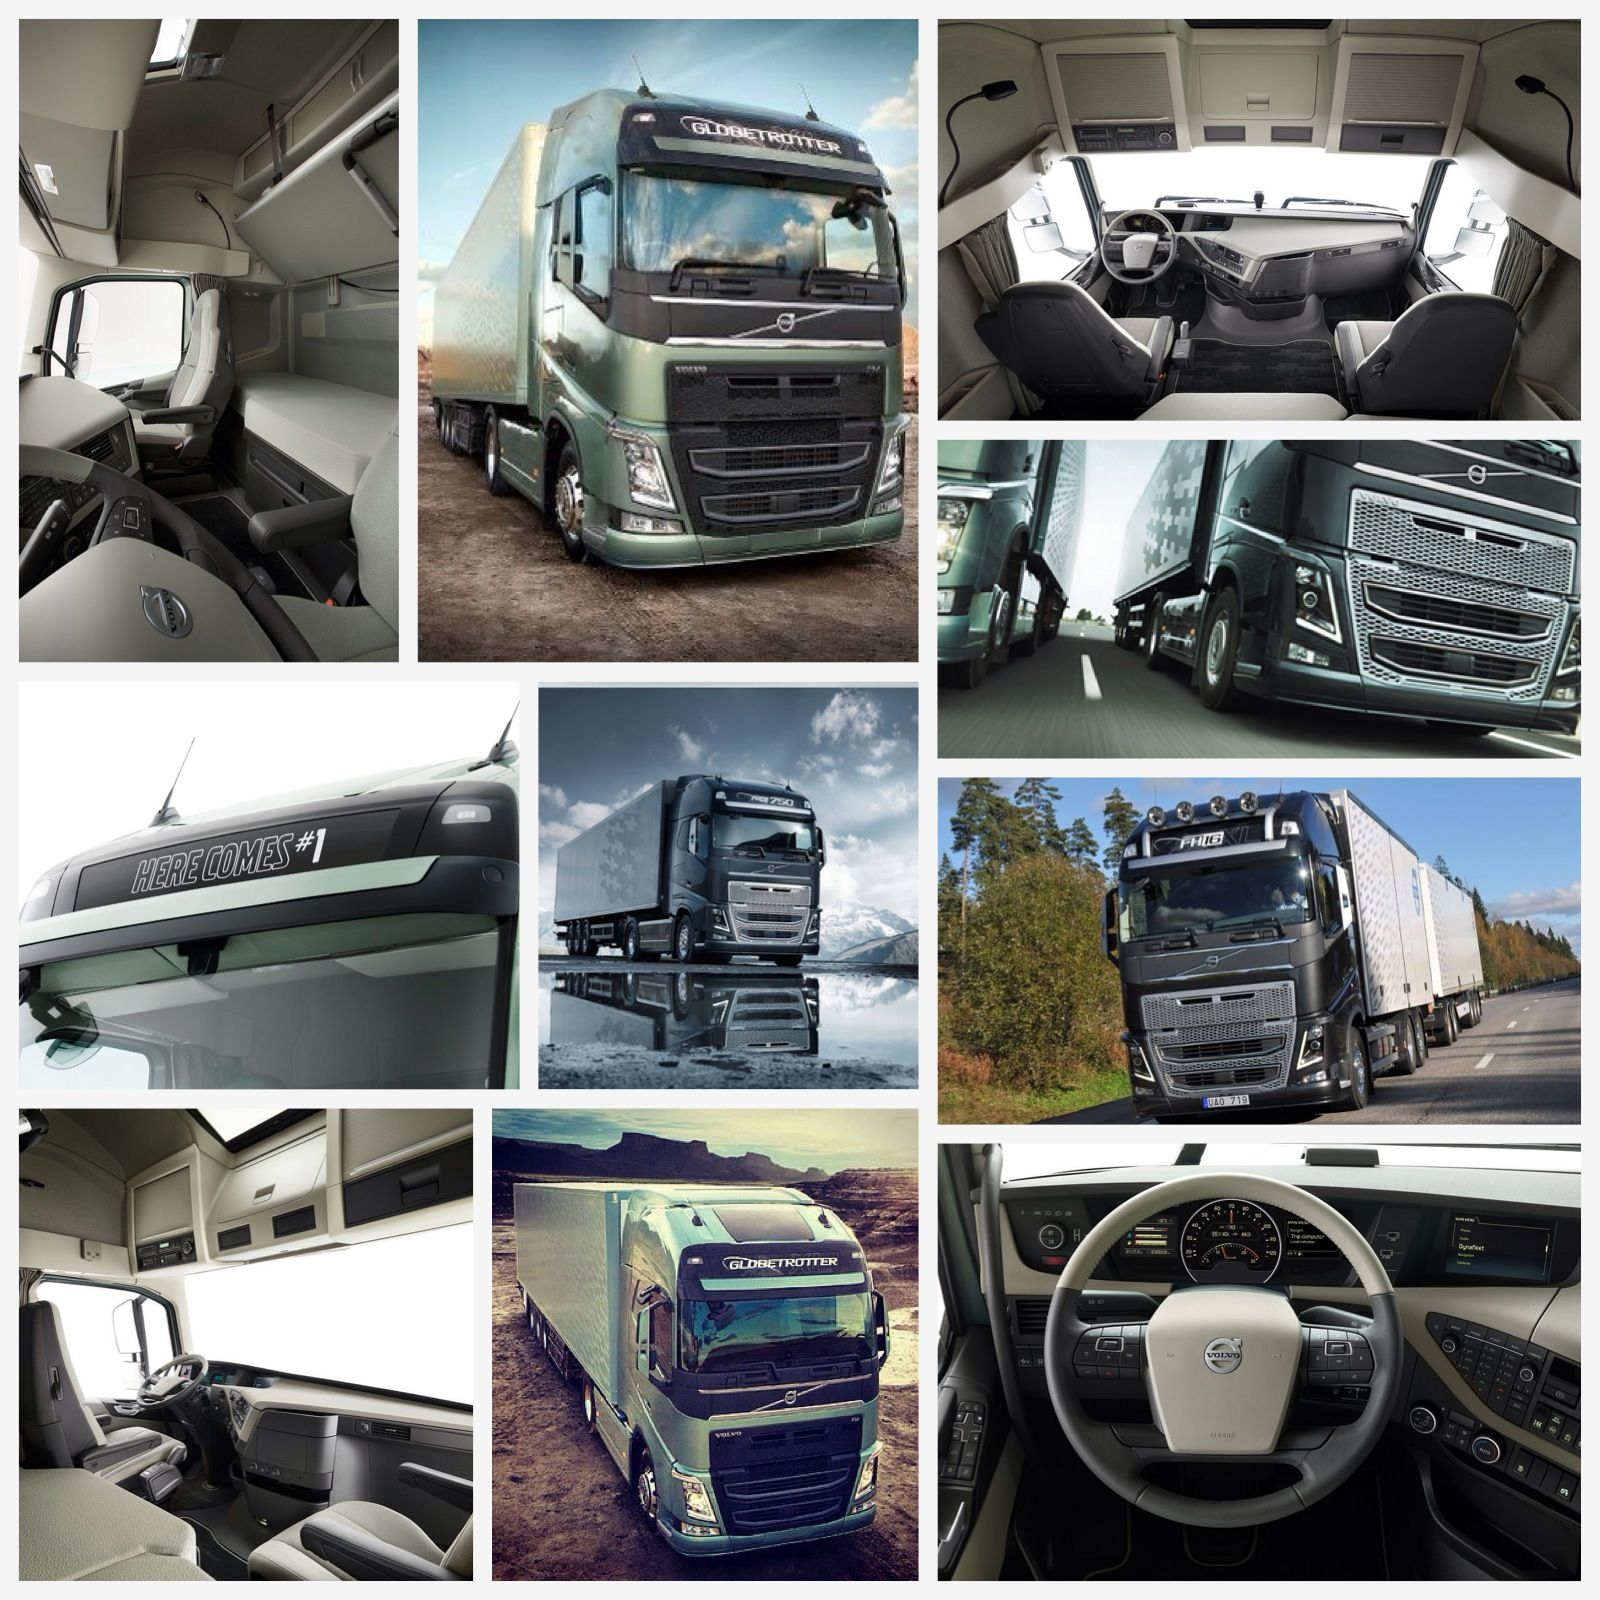 880 Volvo Trucks For Sale: Volvo FH Series